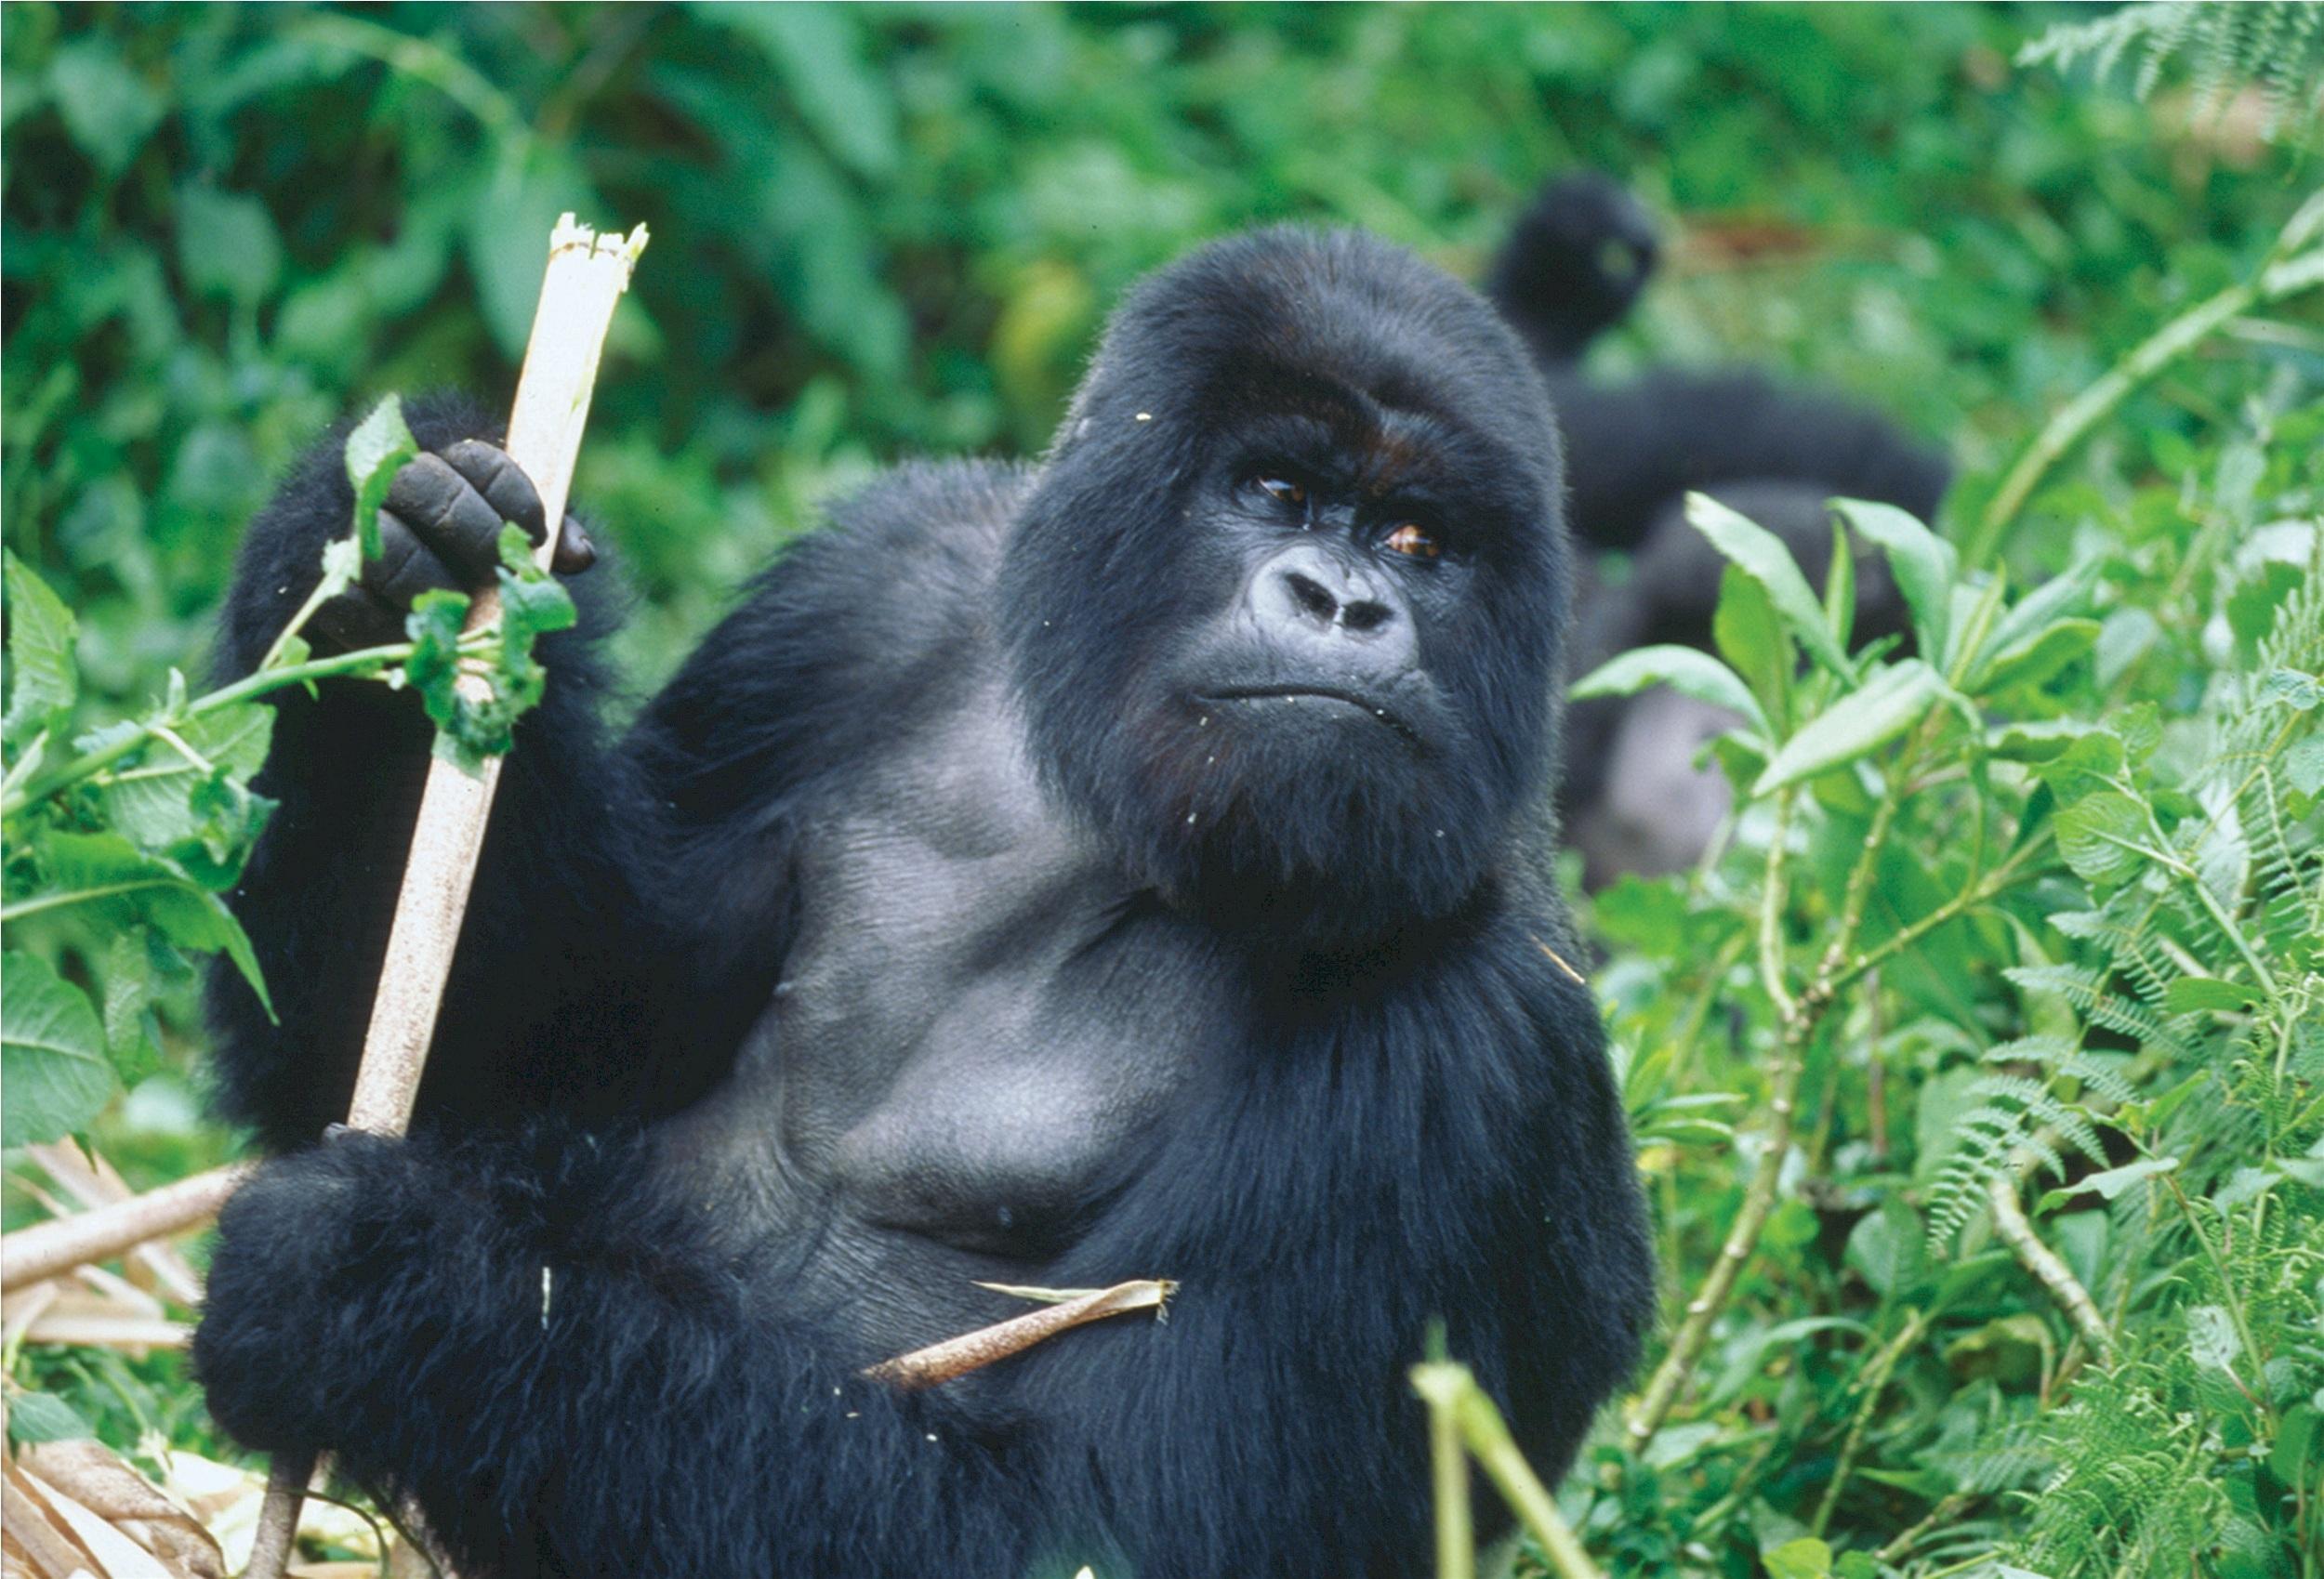 Silverback Gorilla, Animal, Black, Gorilla, Powerful, HQ Photo